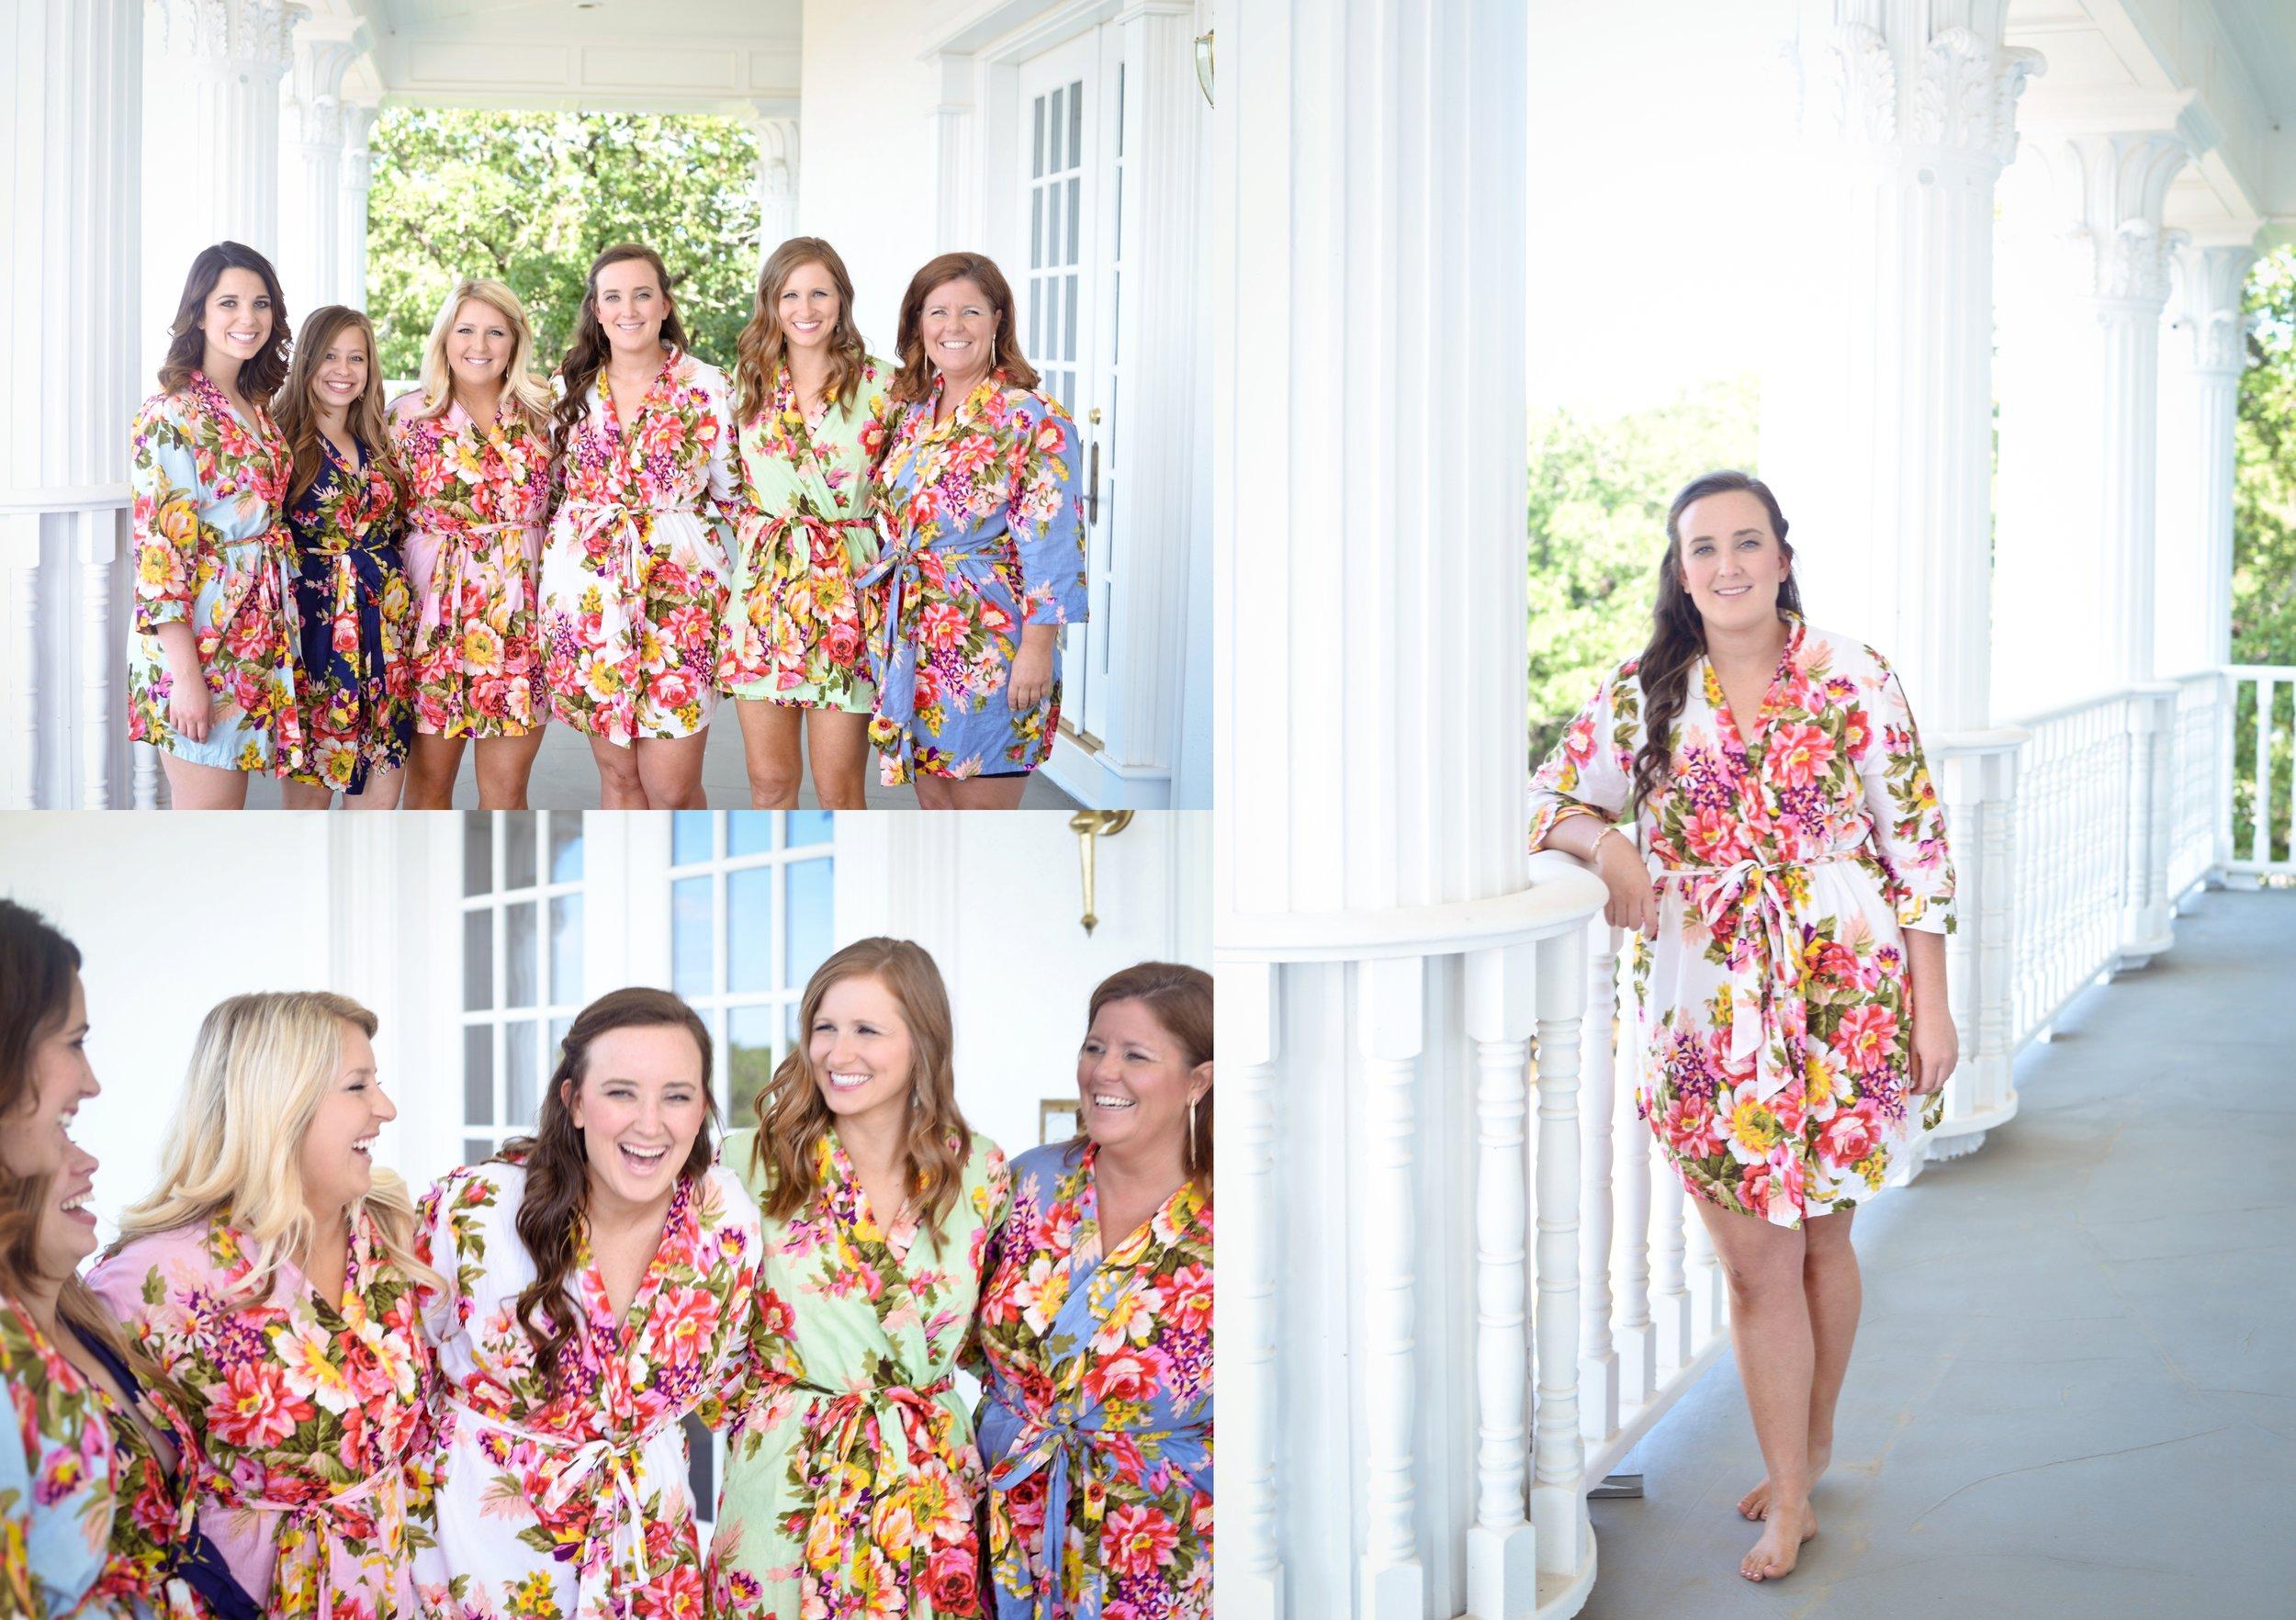 Lonestar-Mansion-Fort-Worth-Wedding-Planner-Burleson-Wedding-Venue_06.jpg